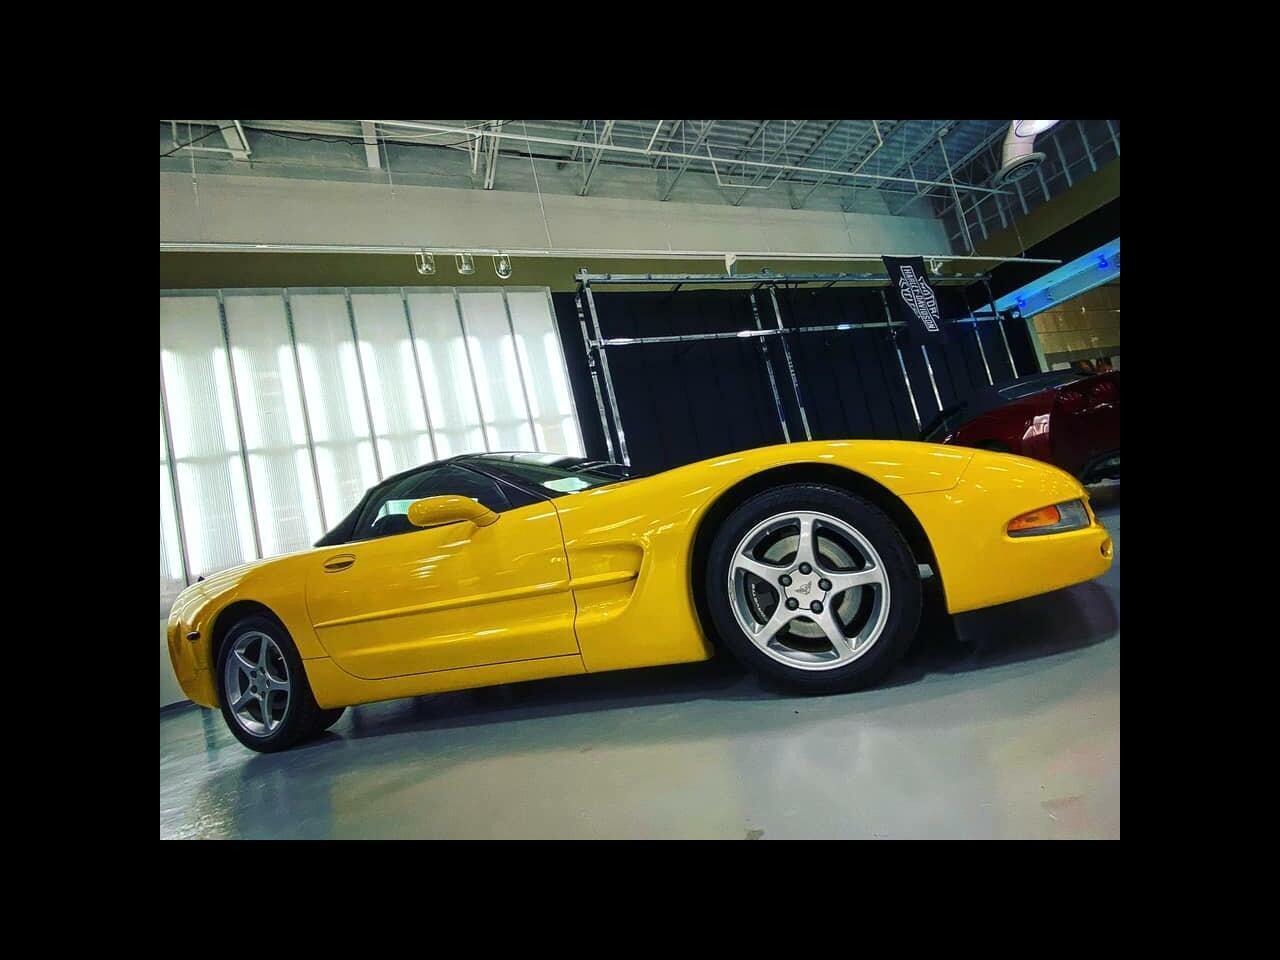 2002 Yellow Chevrolet Corvette Convertible    C5 Corvette Photo 2